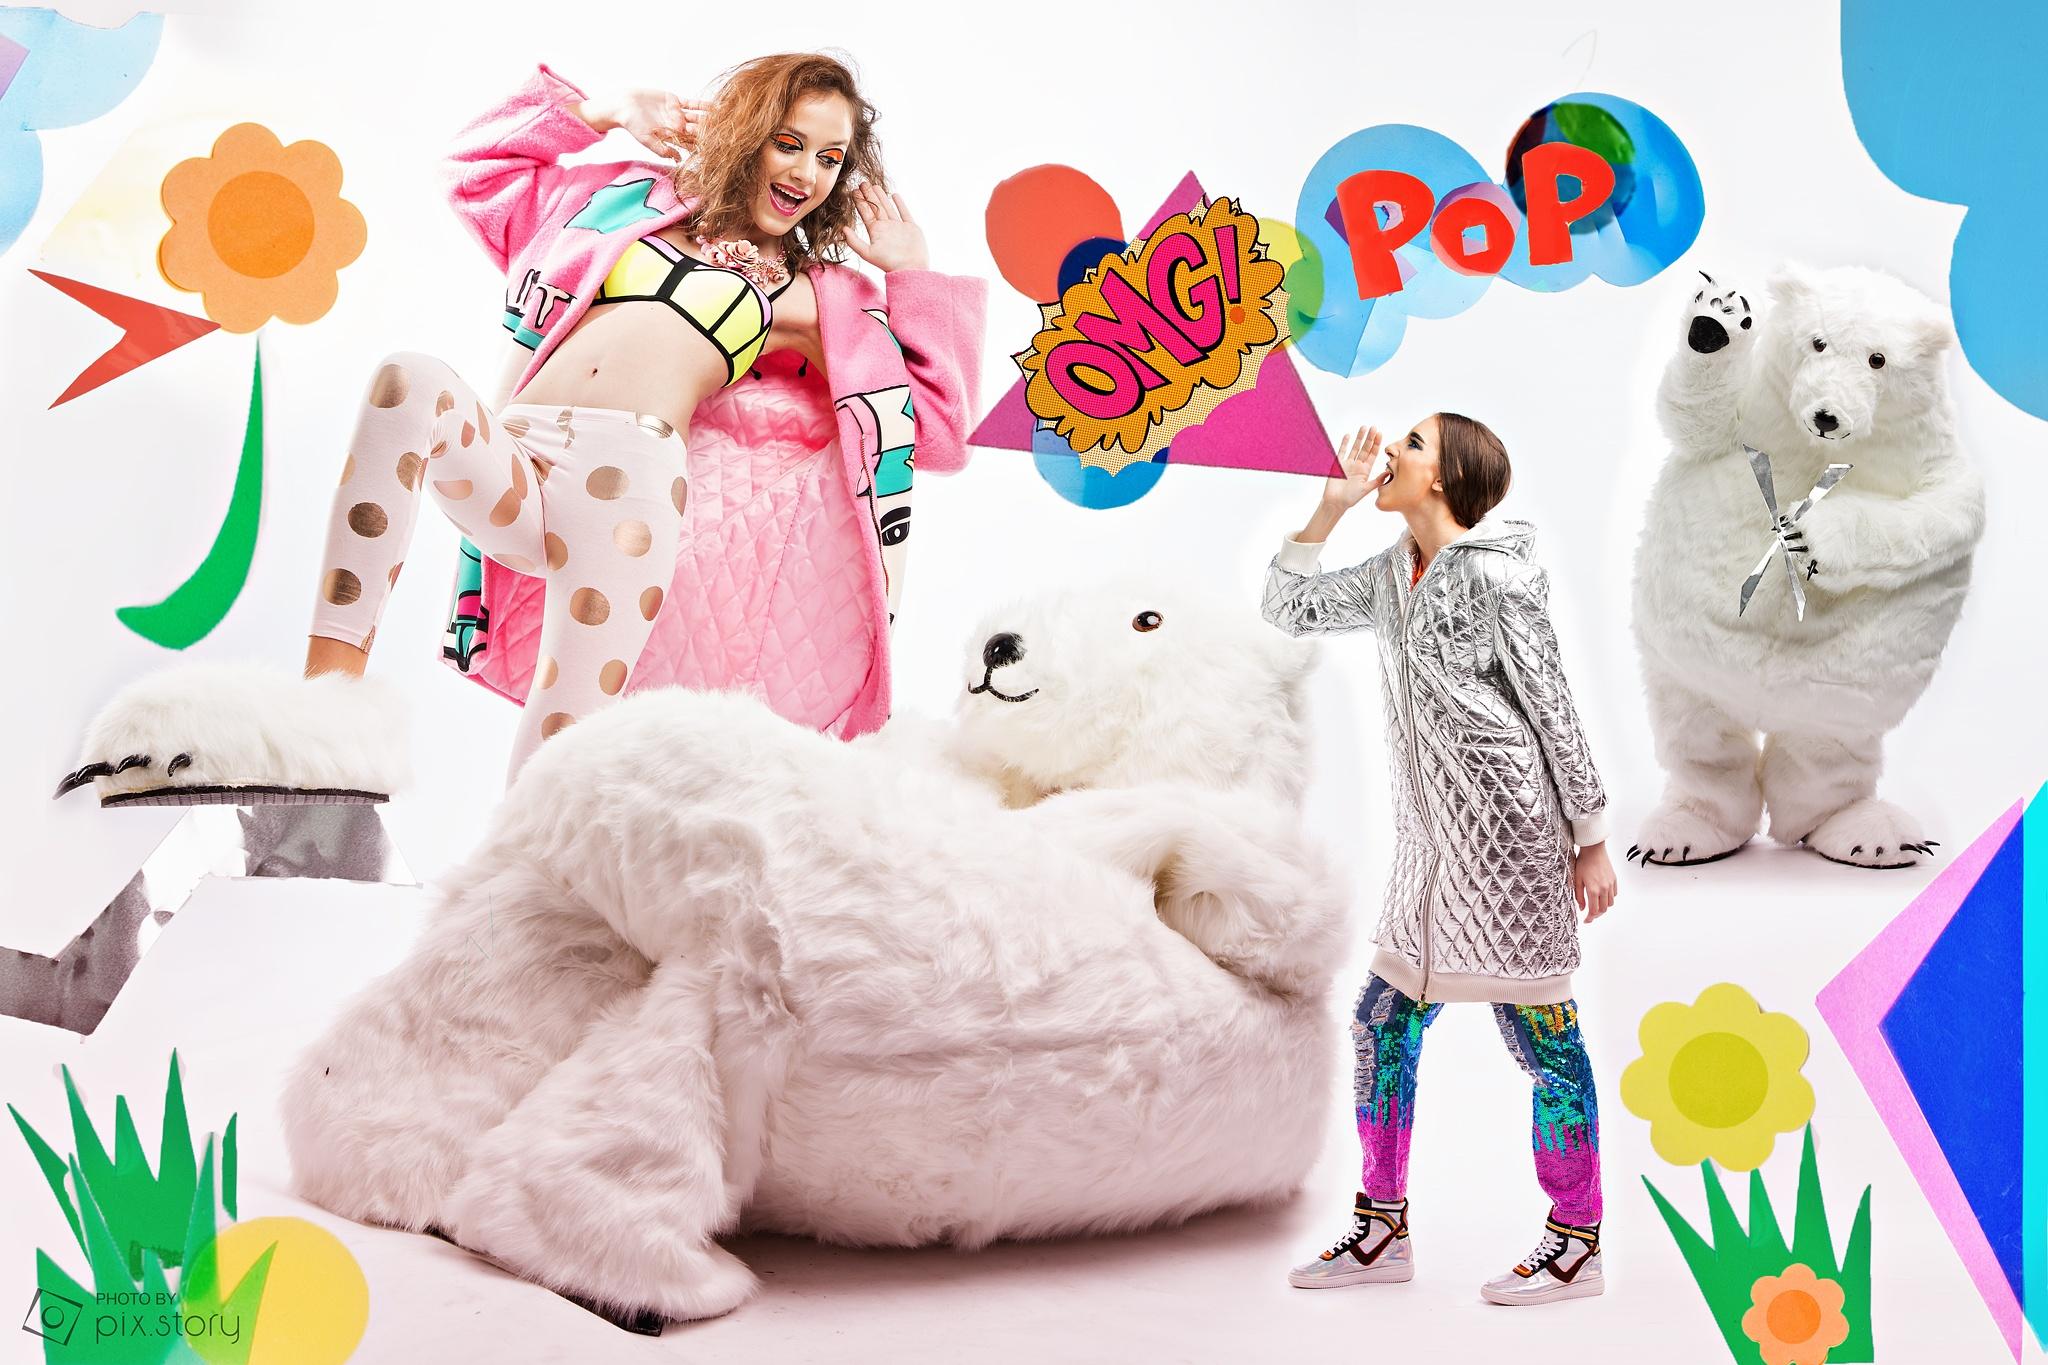 Top of the Pop by Leonard Chua